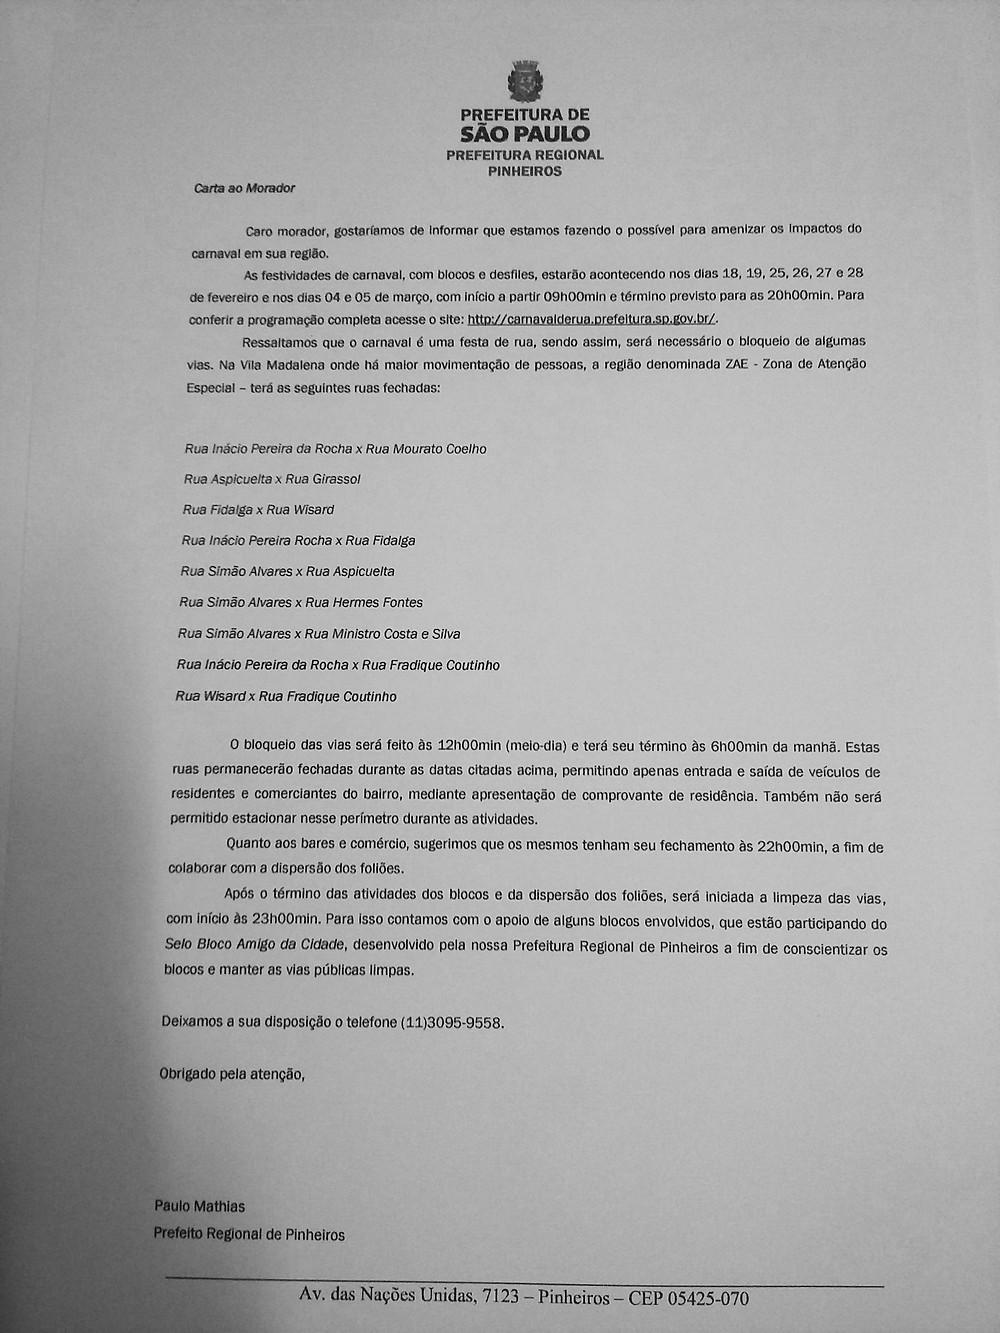 Carta ao morador